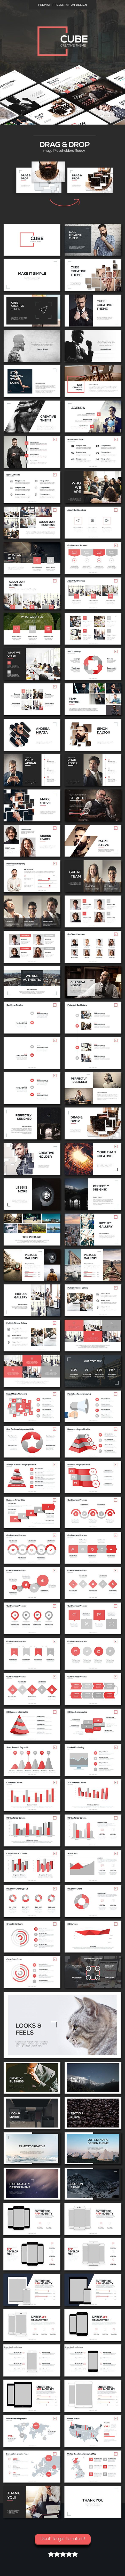 CUBE – Creative Theme (PowerPoint Templates)